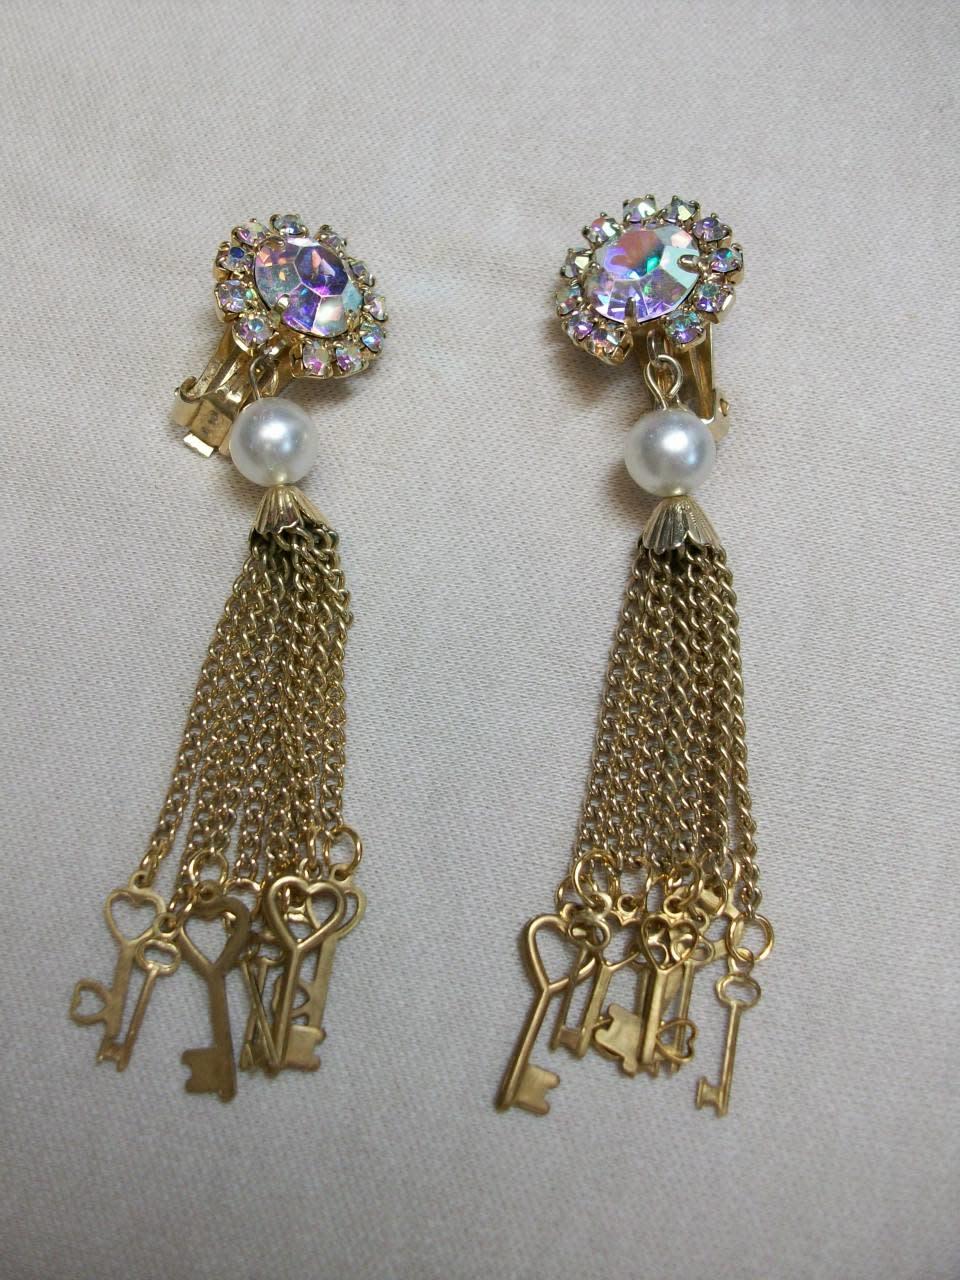 Sharon B's Originals Gold & Crystal Clip-on Chandelier Earrings